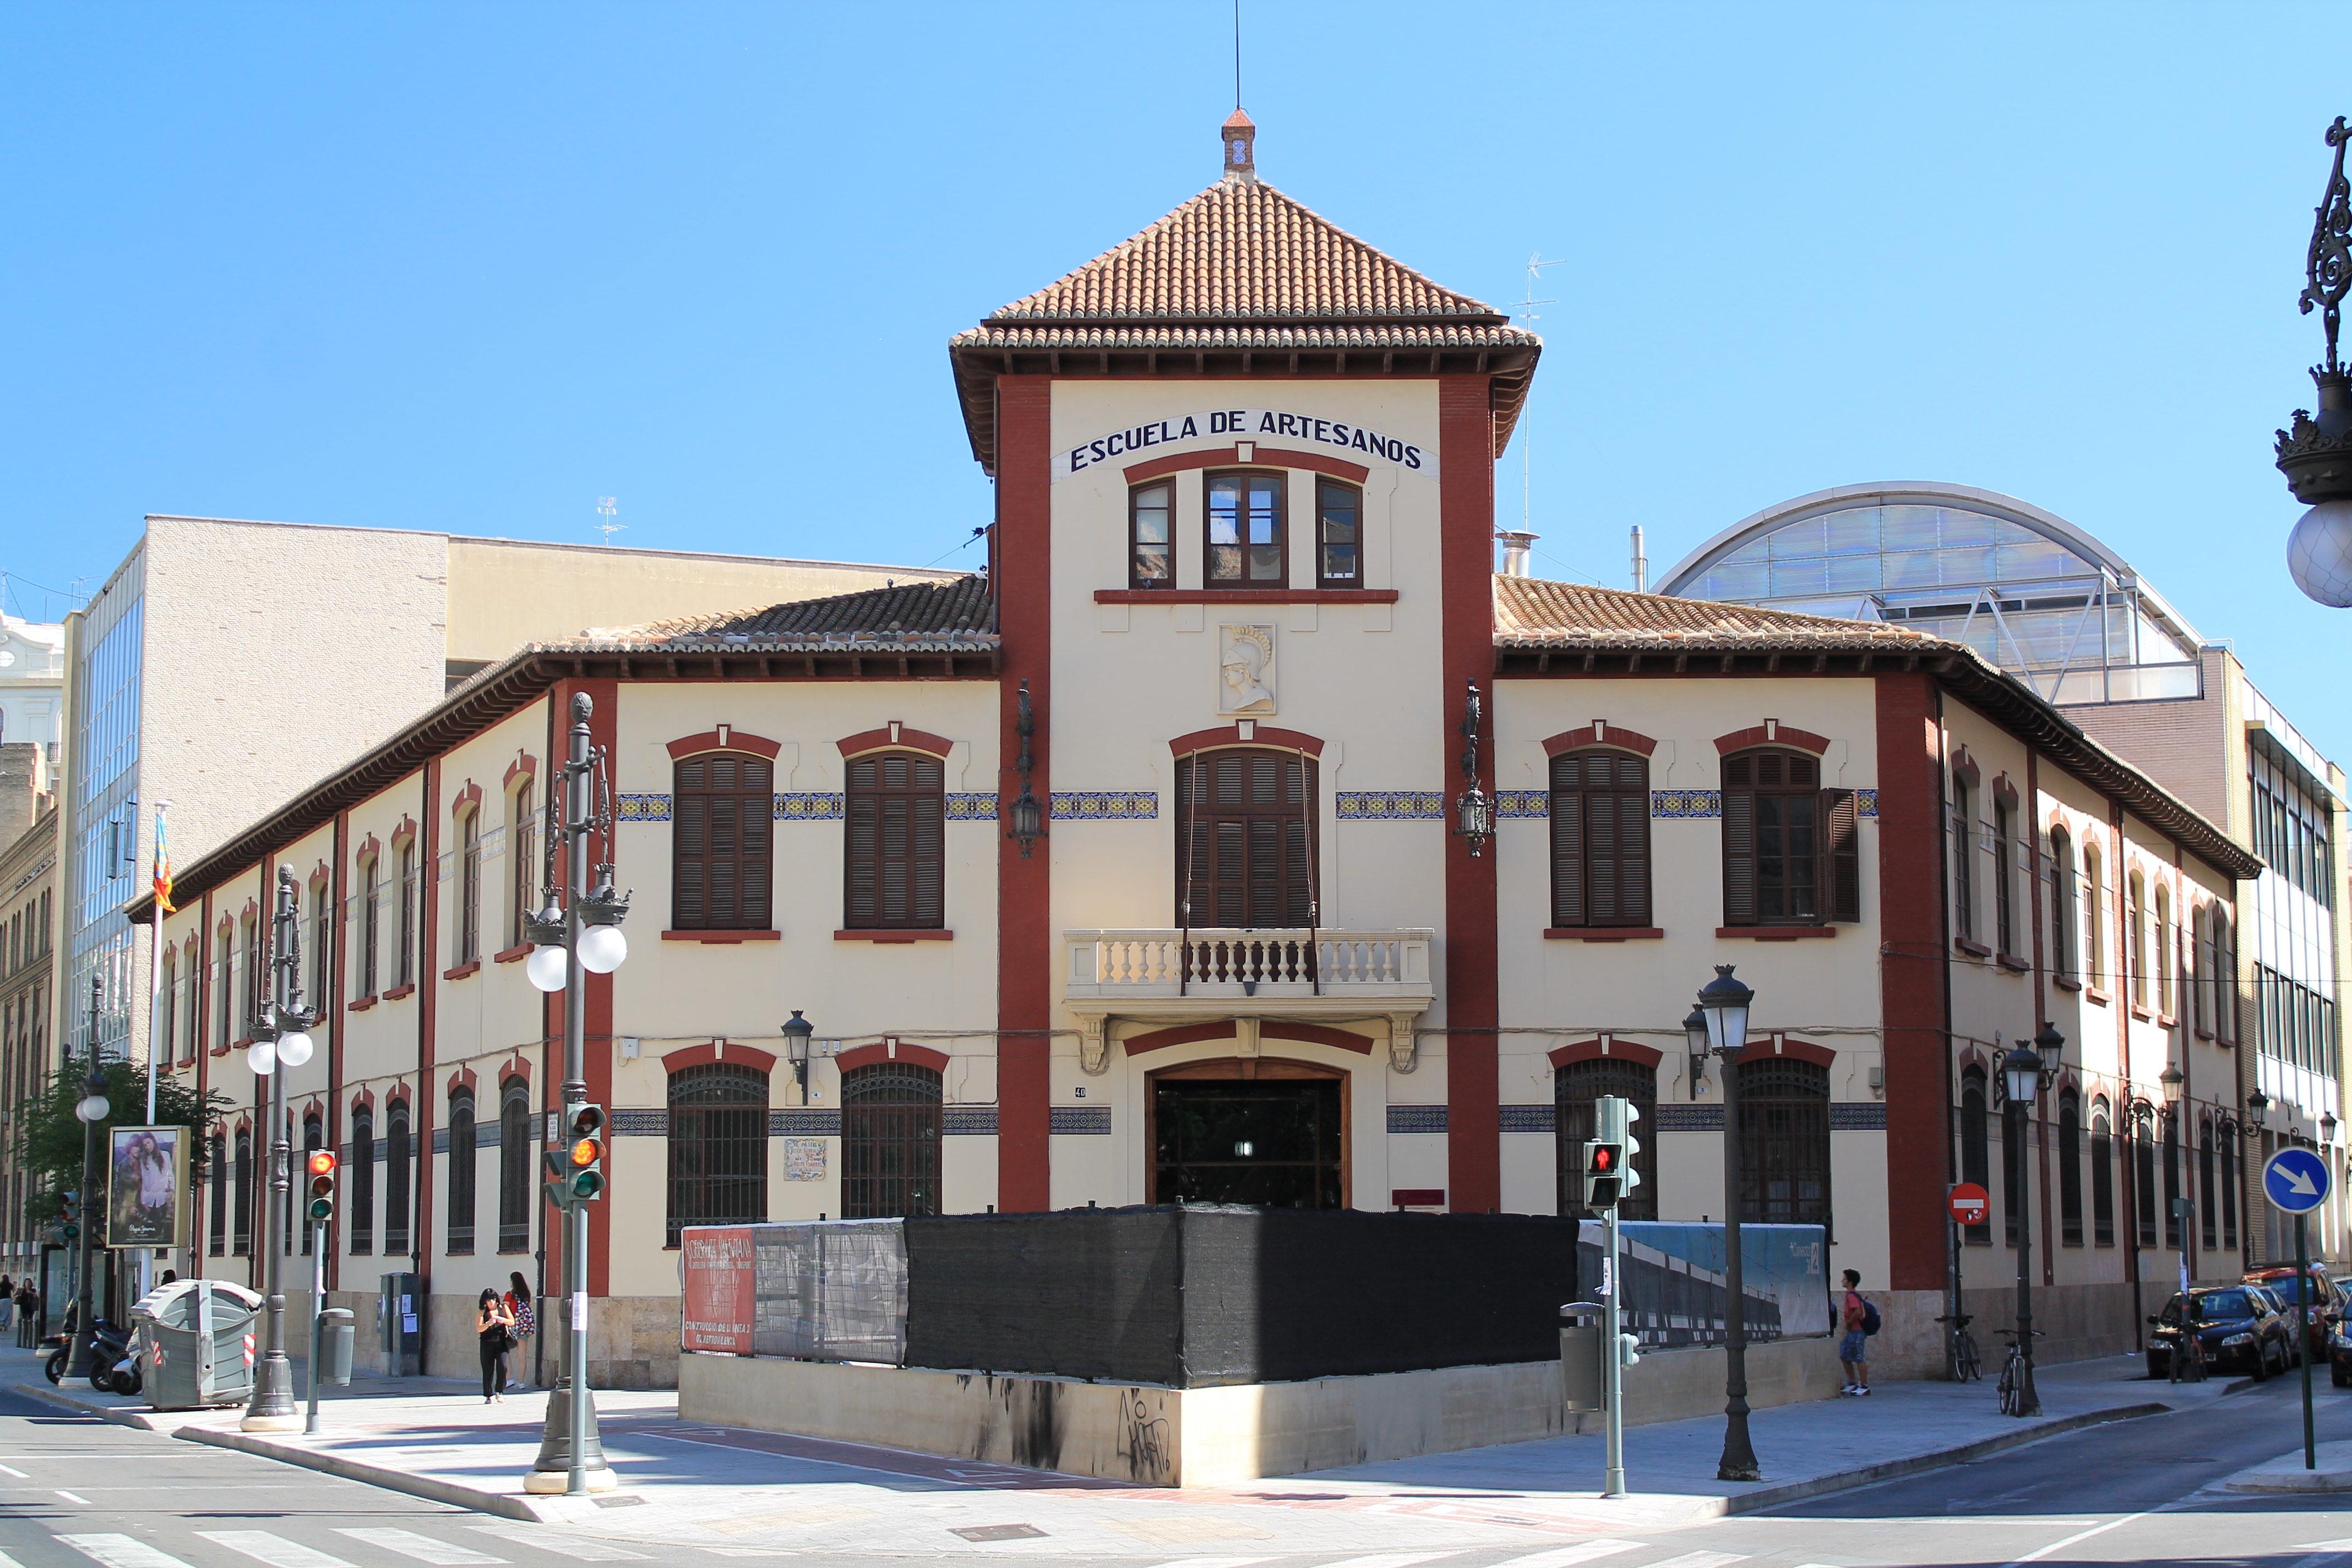 file escuela de artesanos wikimedia commons